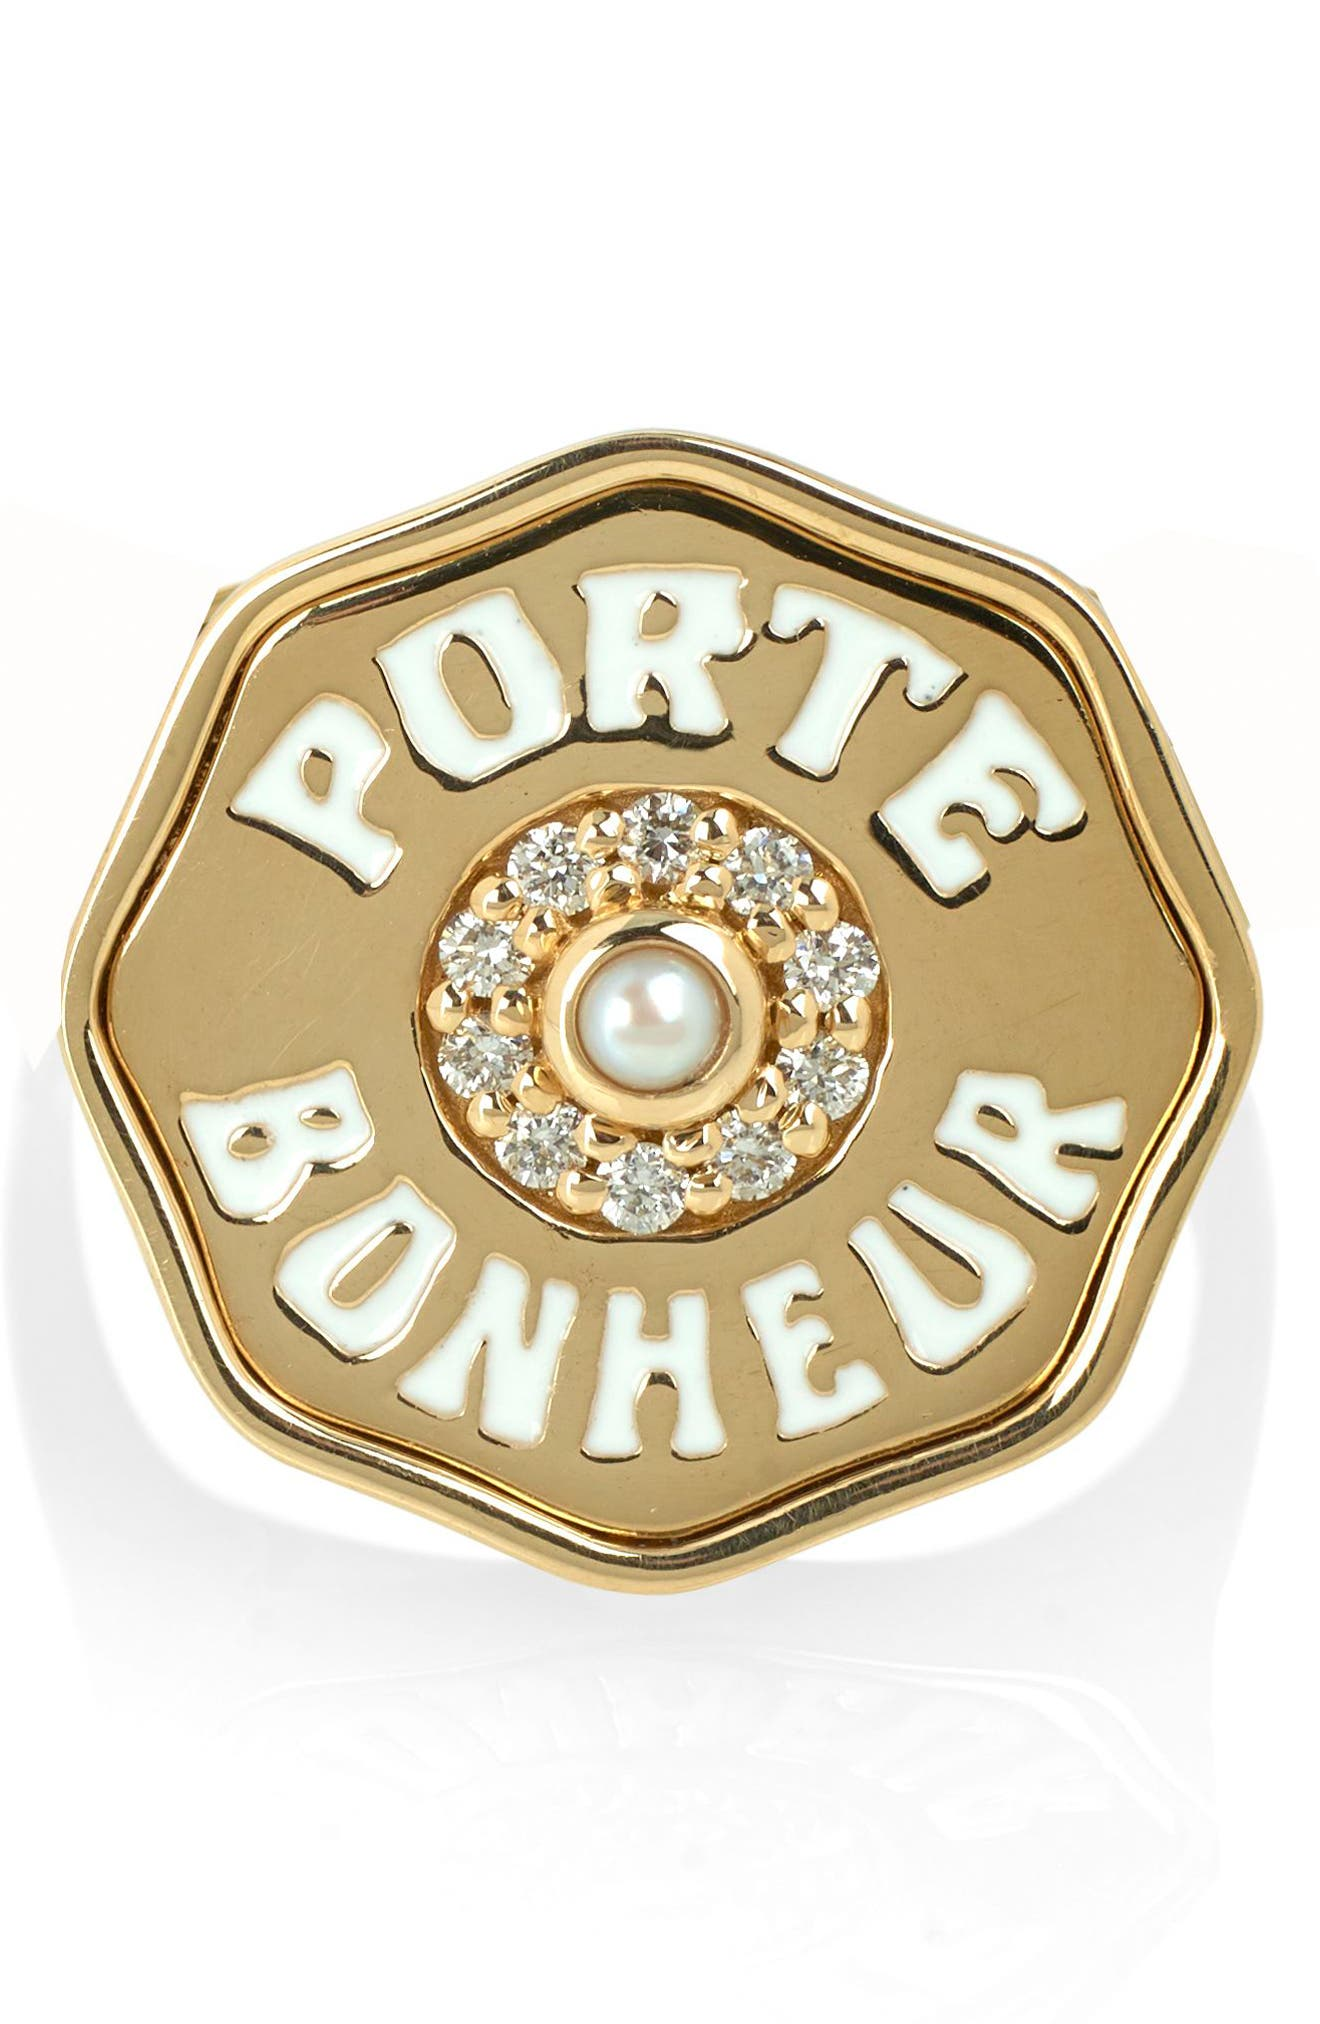 Porte Bonhuer Coin Ring,                             Alternate thumbnail 2, color,                             YELLOW GOLD